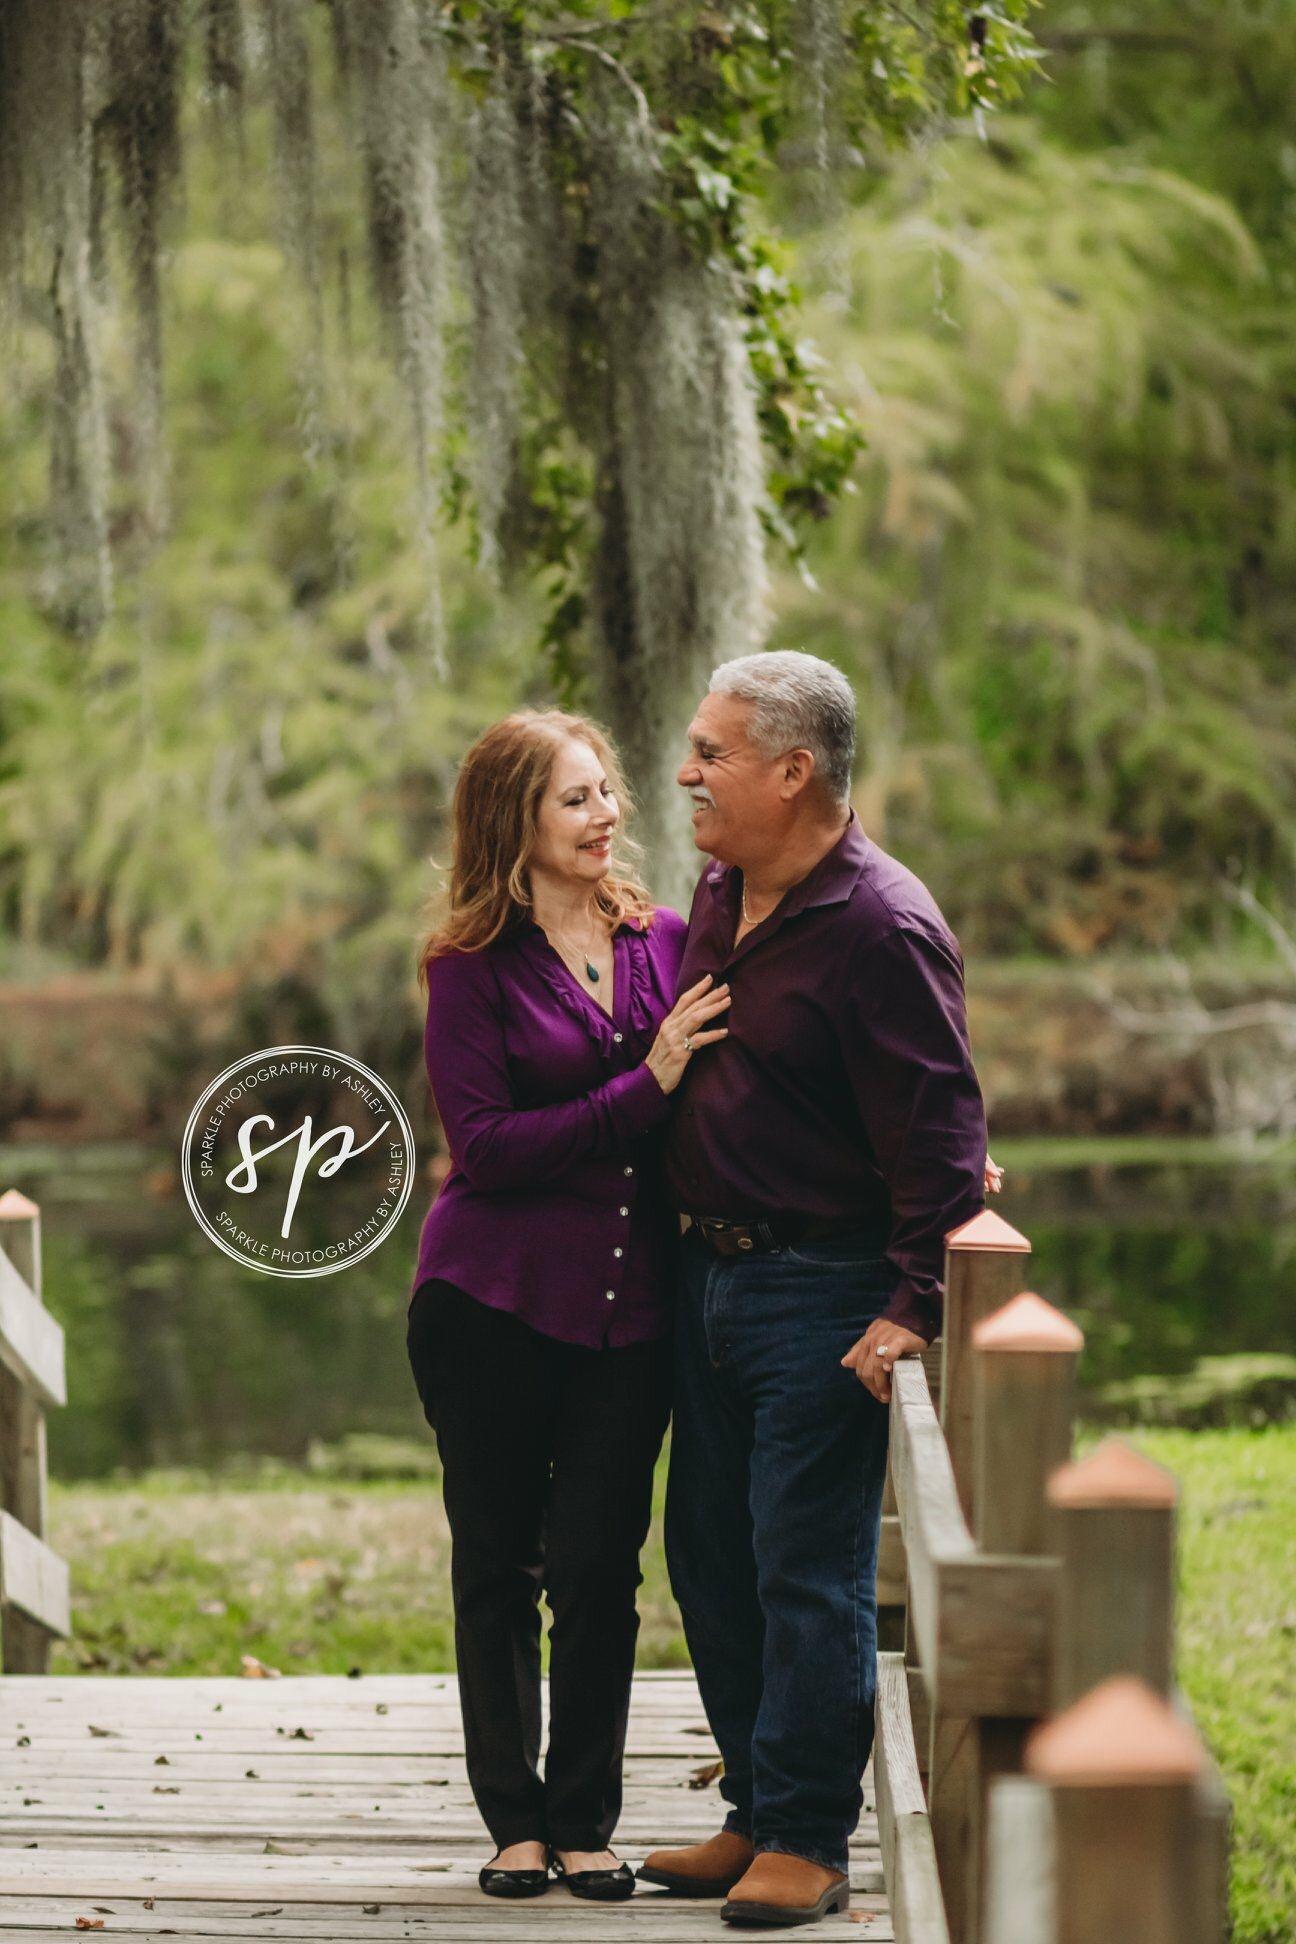 Cypress dating 2 propan tank krok upp